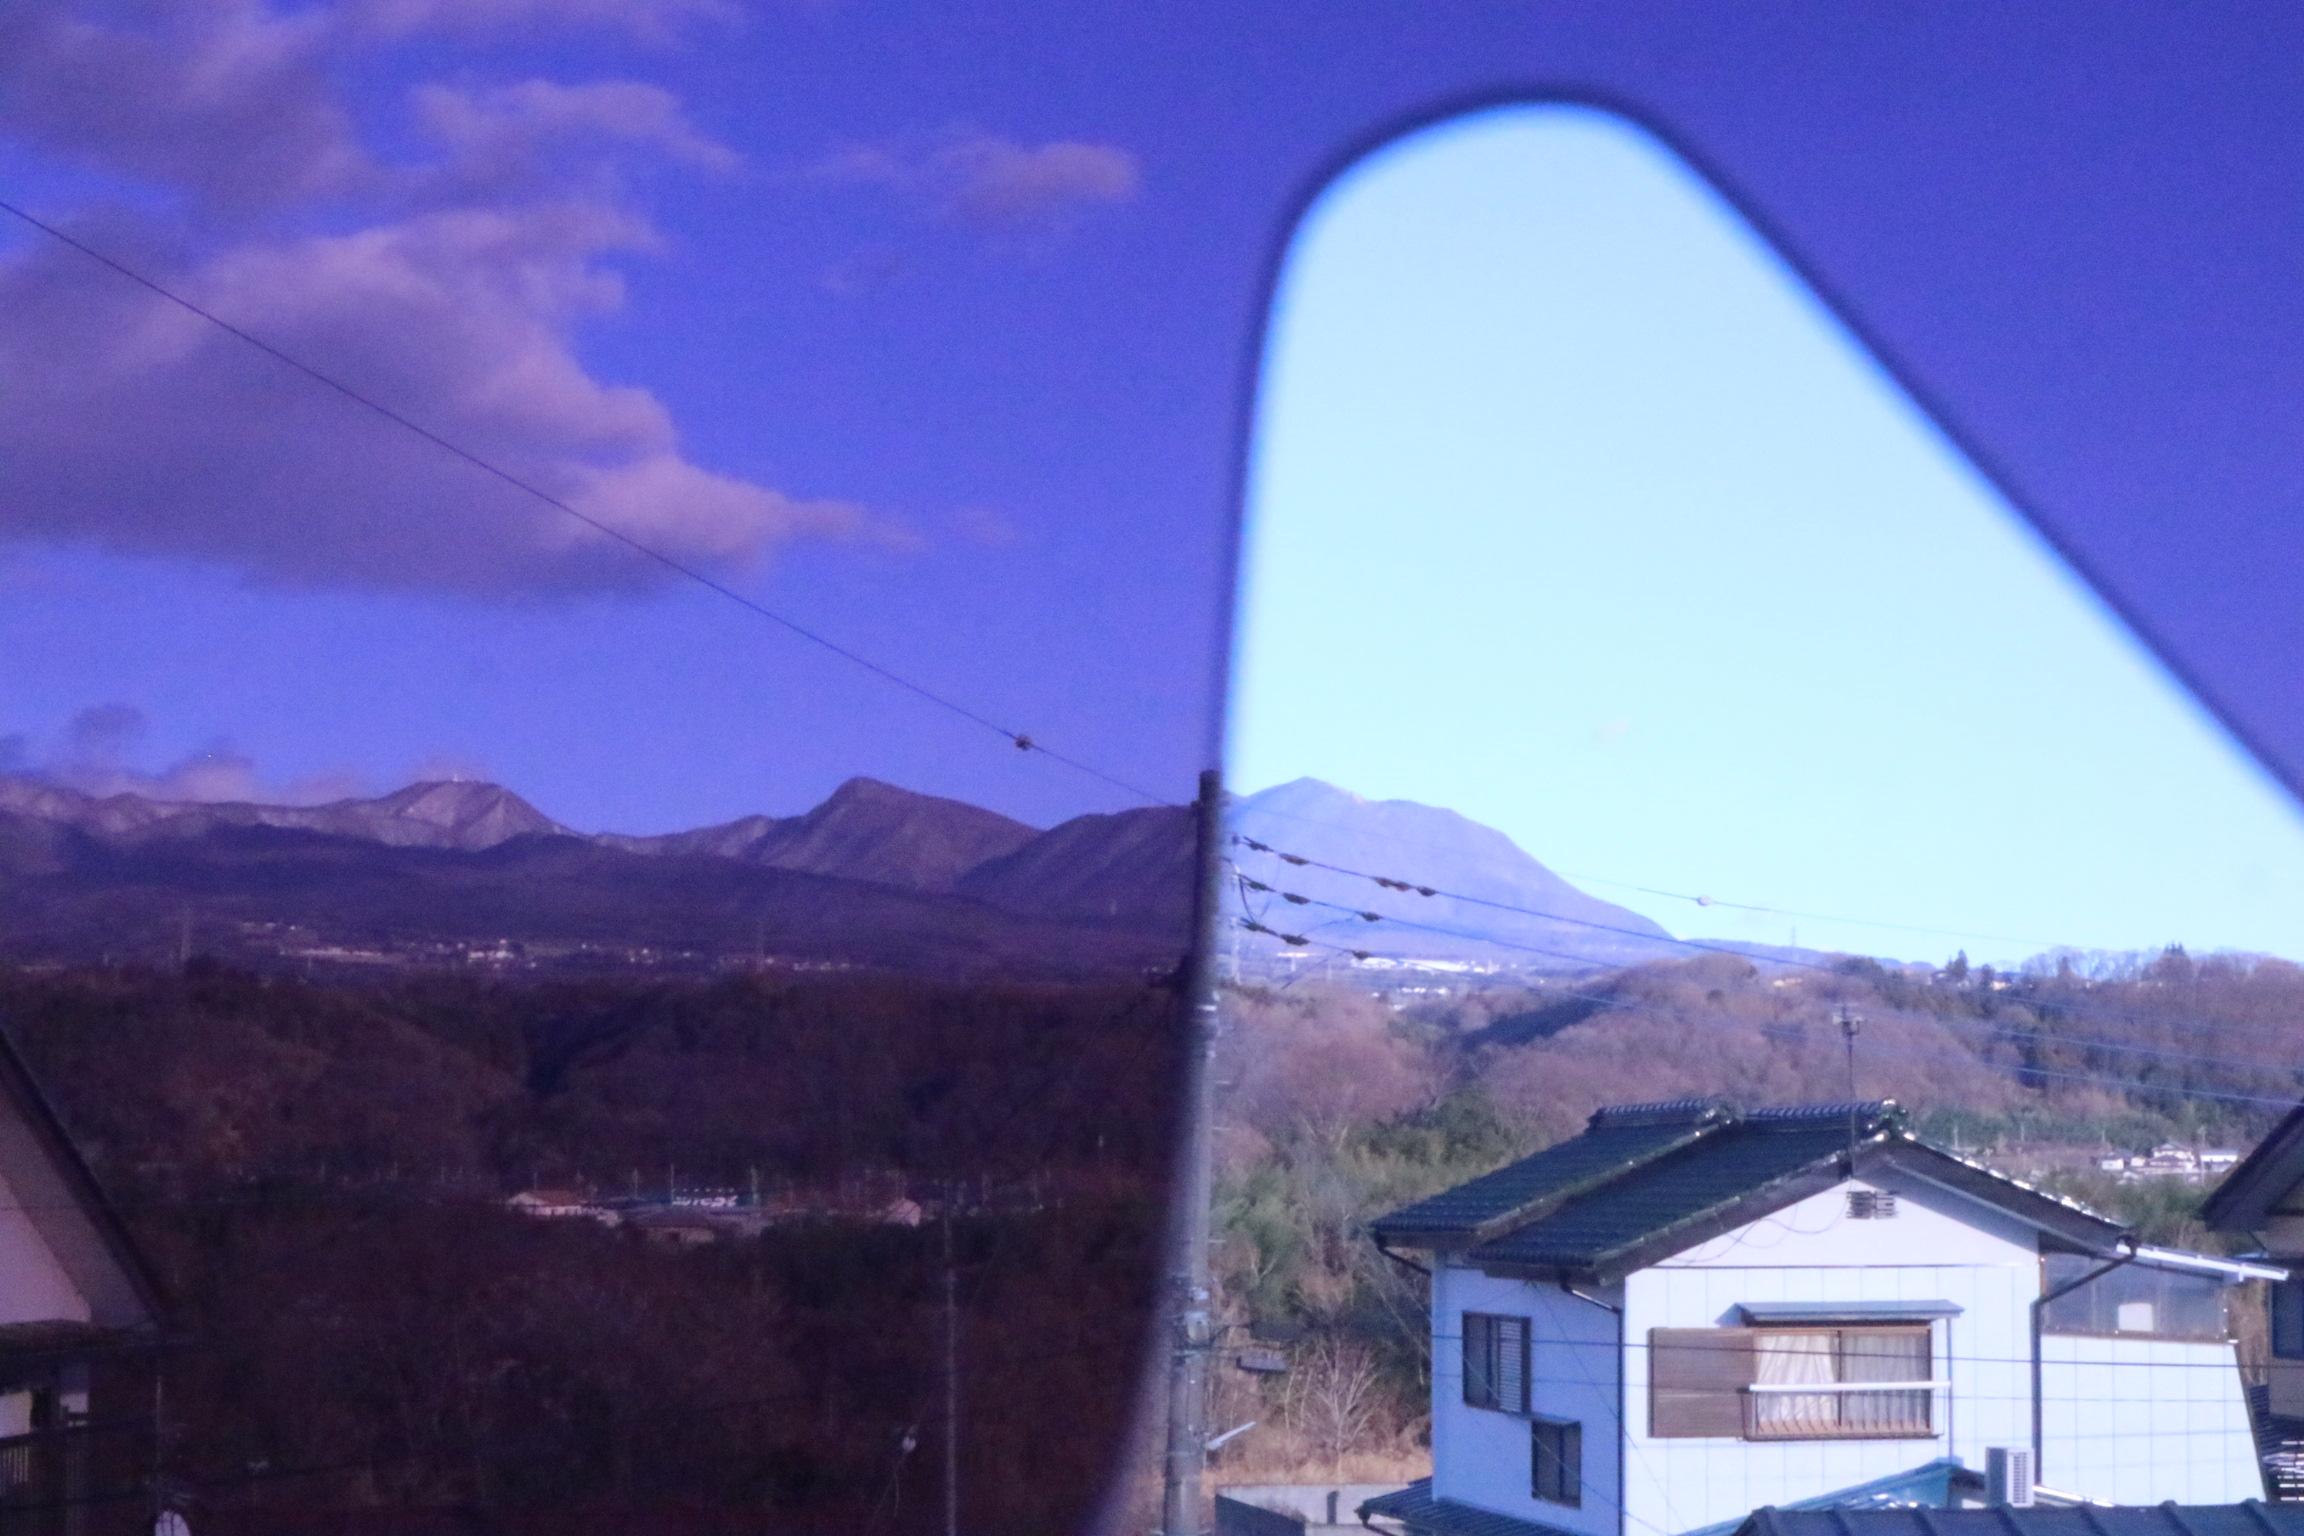 prizm-lens